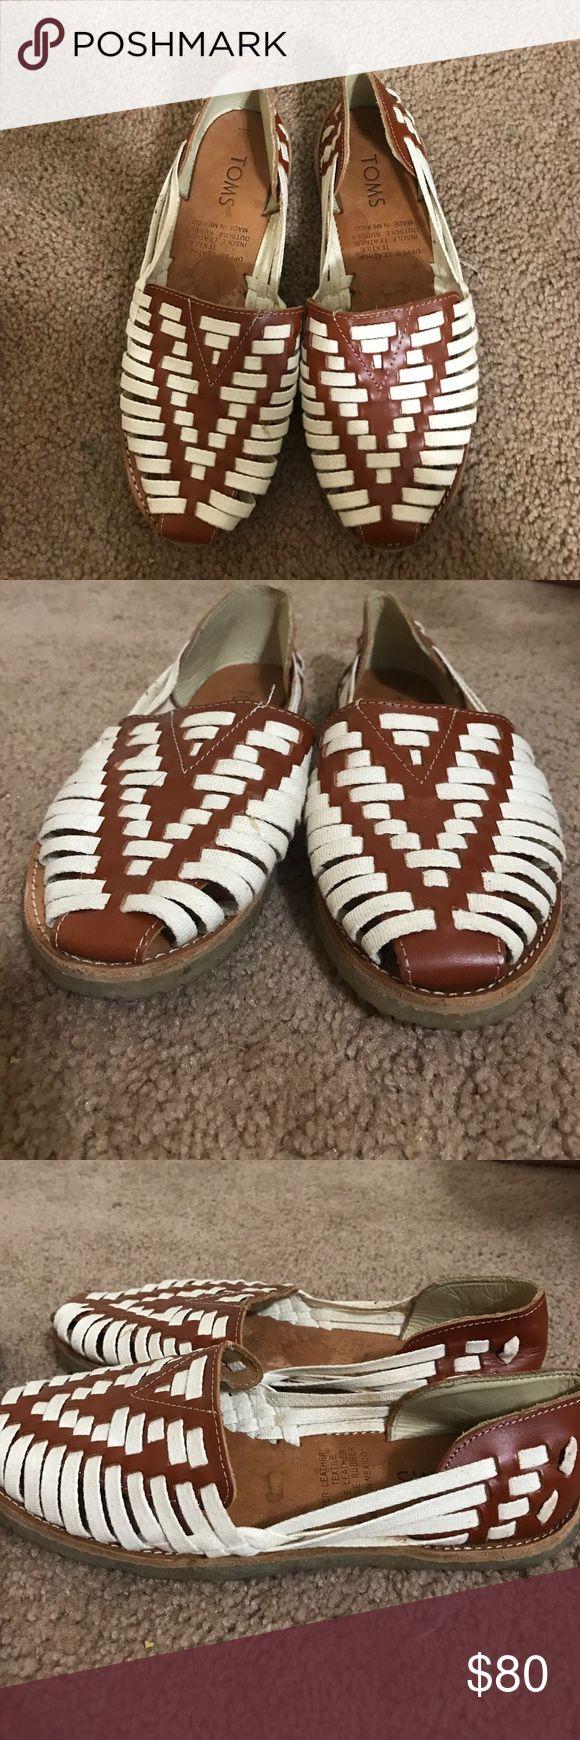 TOMS espadrilles Brand new TOMS espadrilles size 7 wide TOMS Shoes Espadrilles